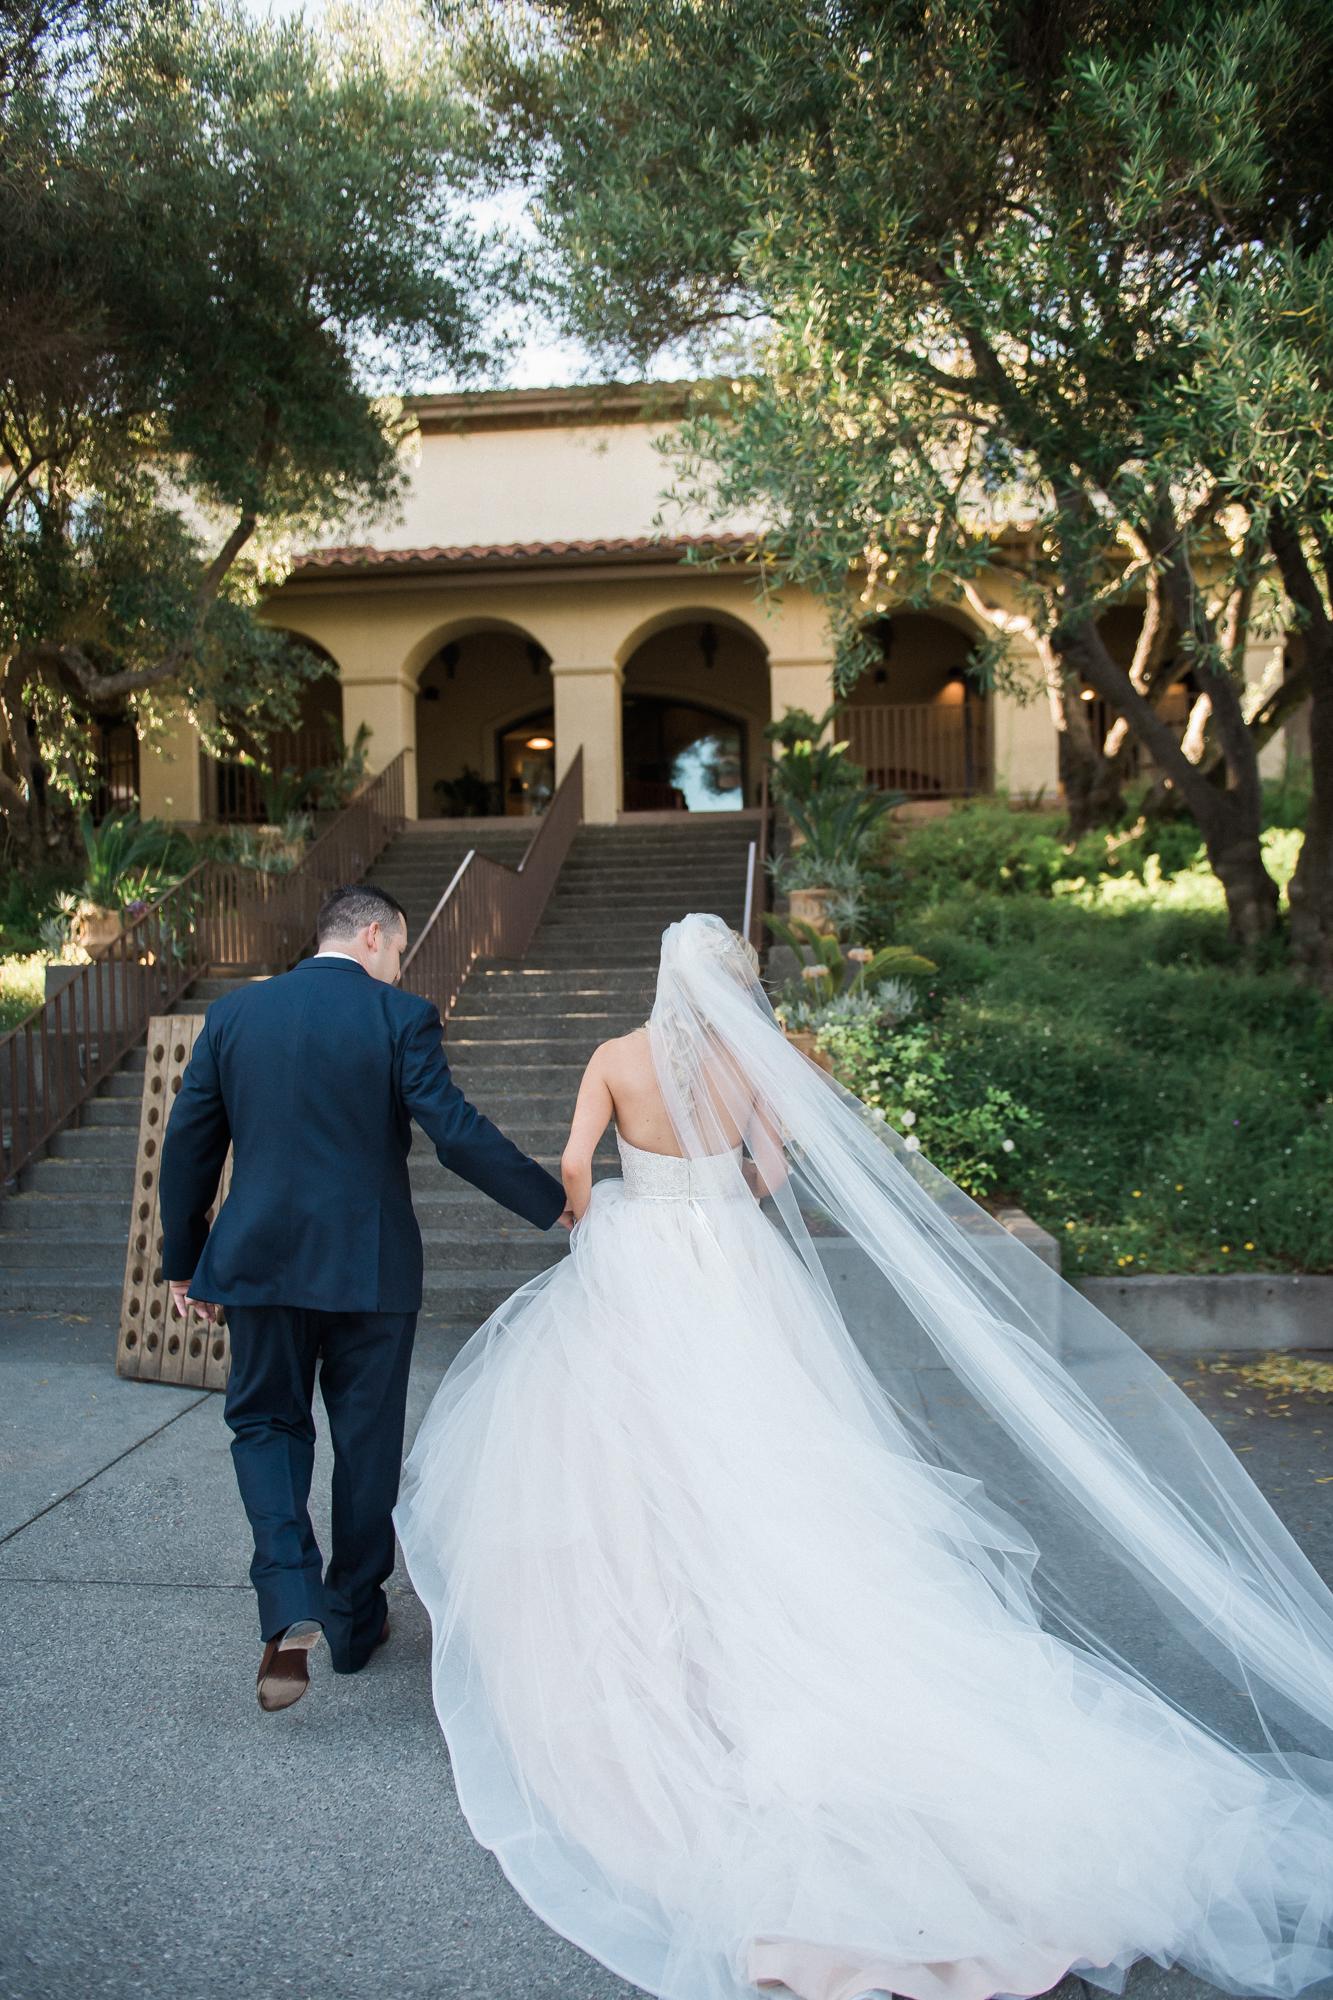 Aimee+Logan_wedding_spp-98.jpg